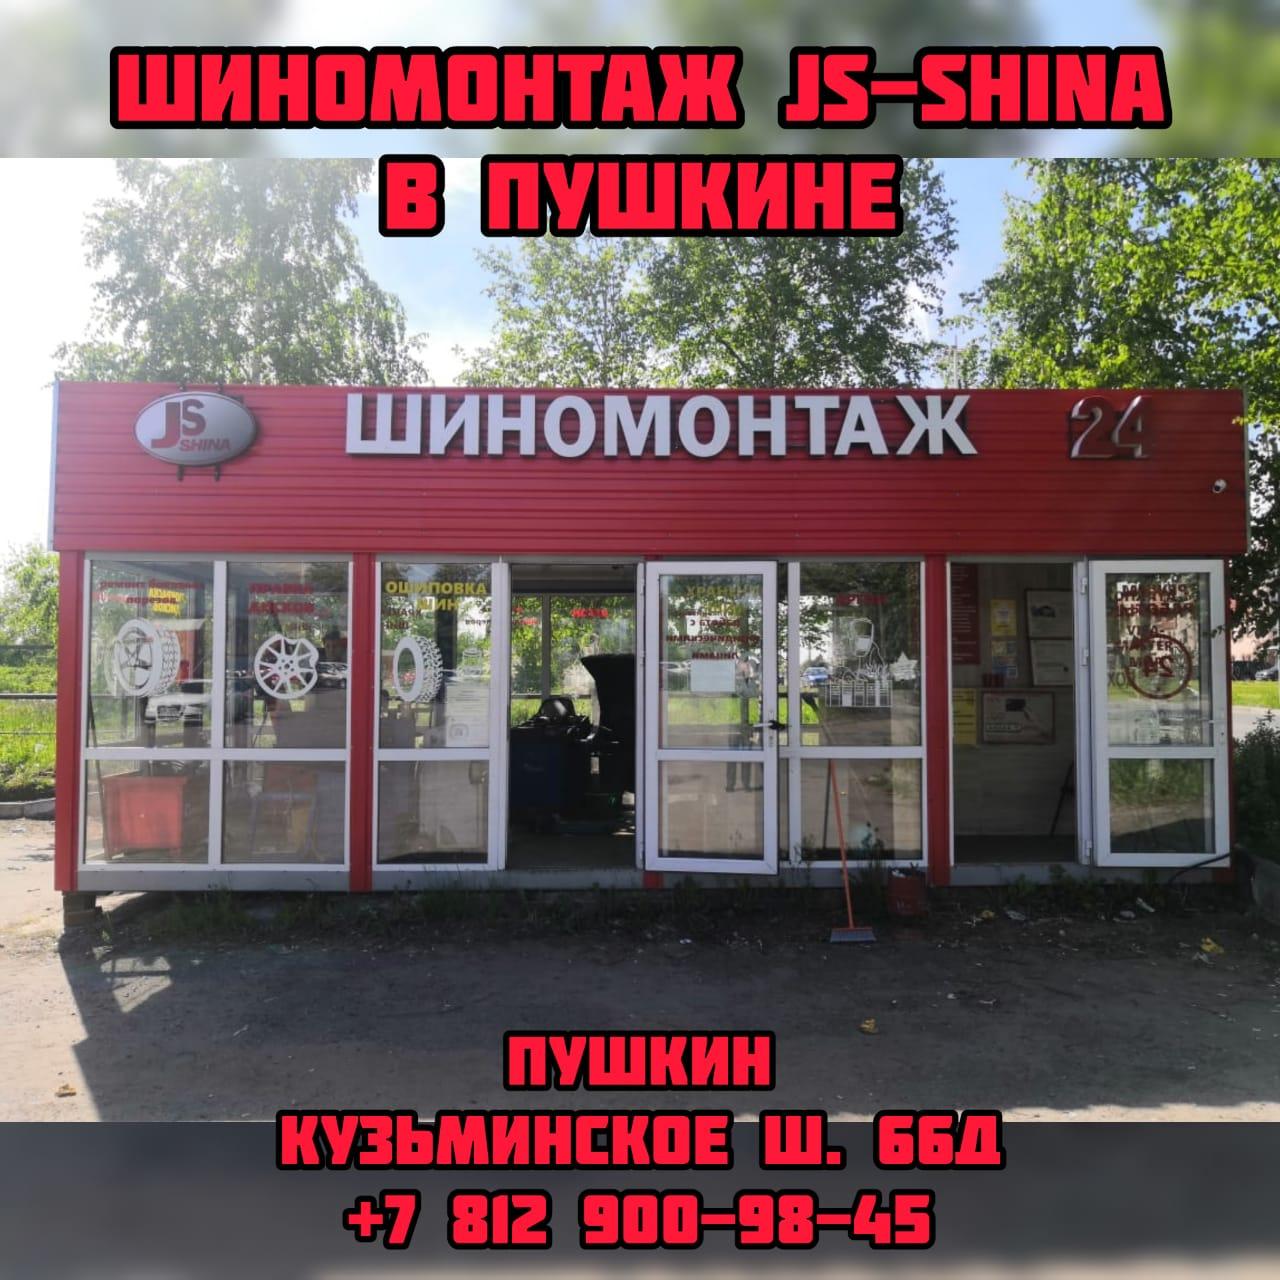 Шиномонтаж 24 часа в Пушкине ремонт дисков круглосуточно JS-Shina